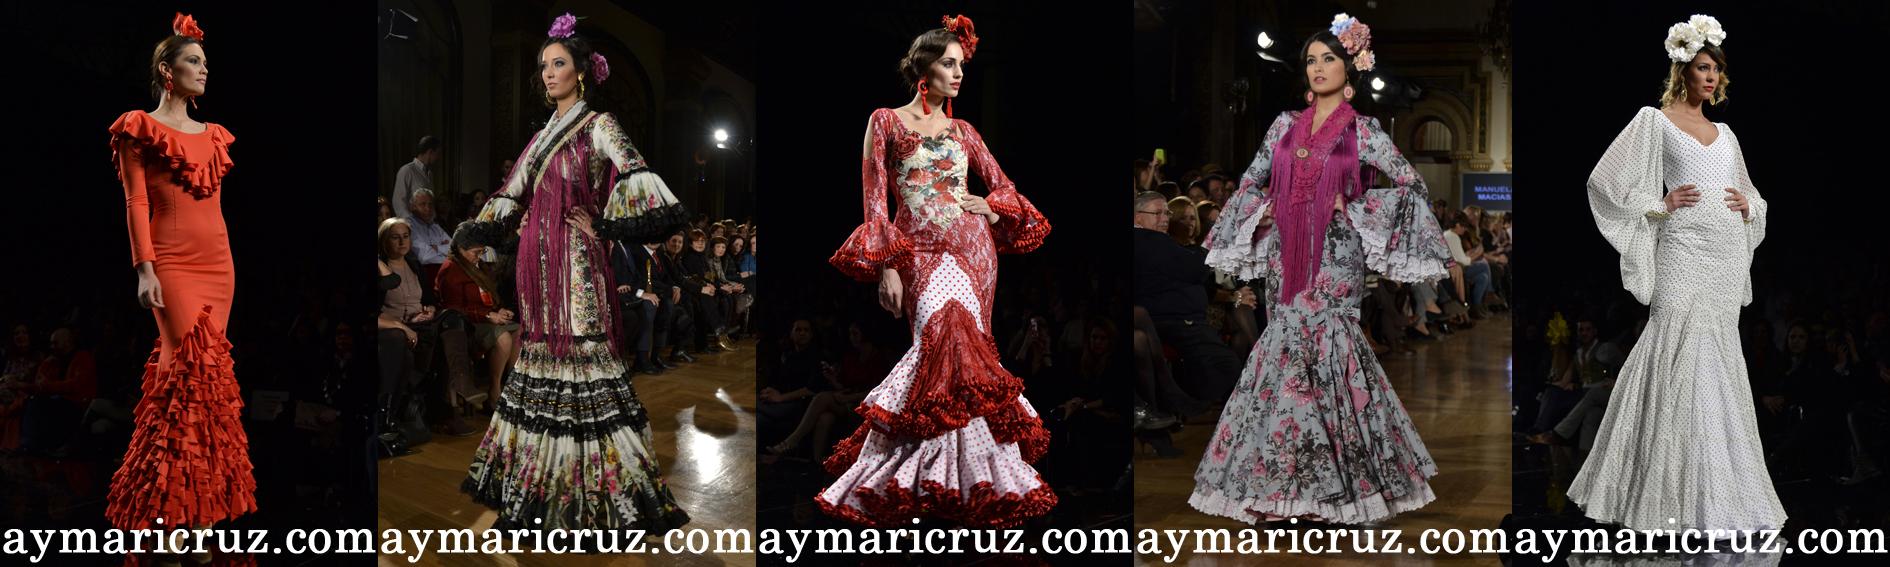 40 trajes para ir a la Feria de Sevilla 2014 (1ª parte)